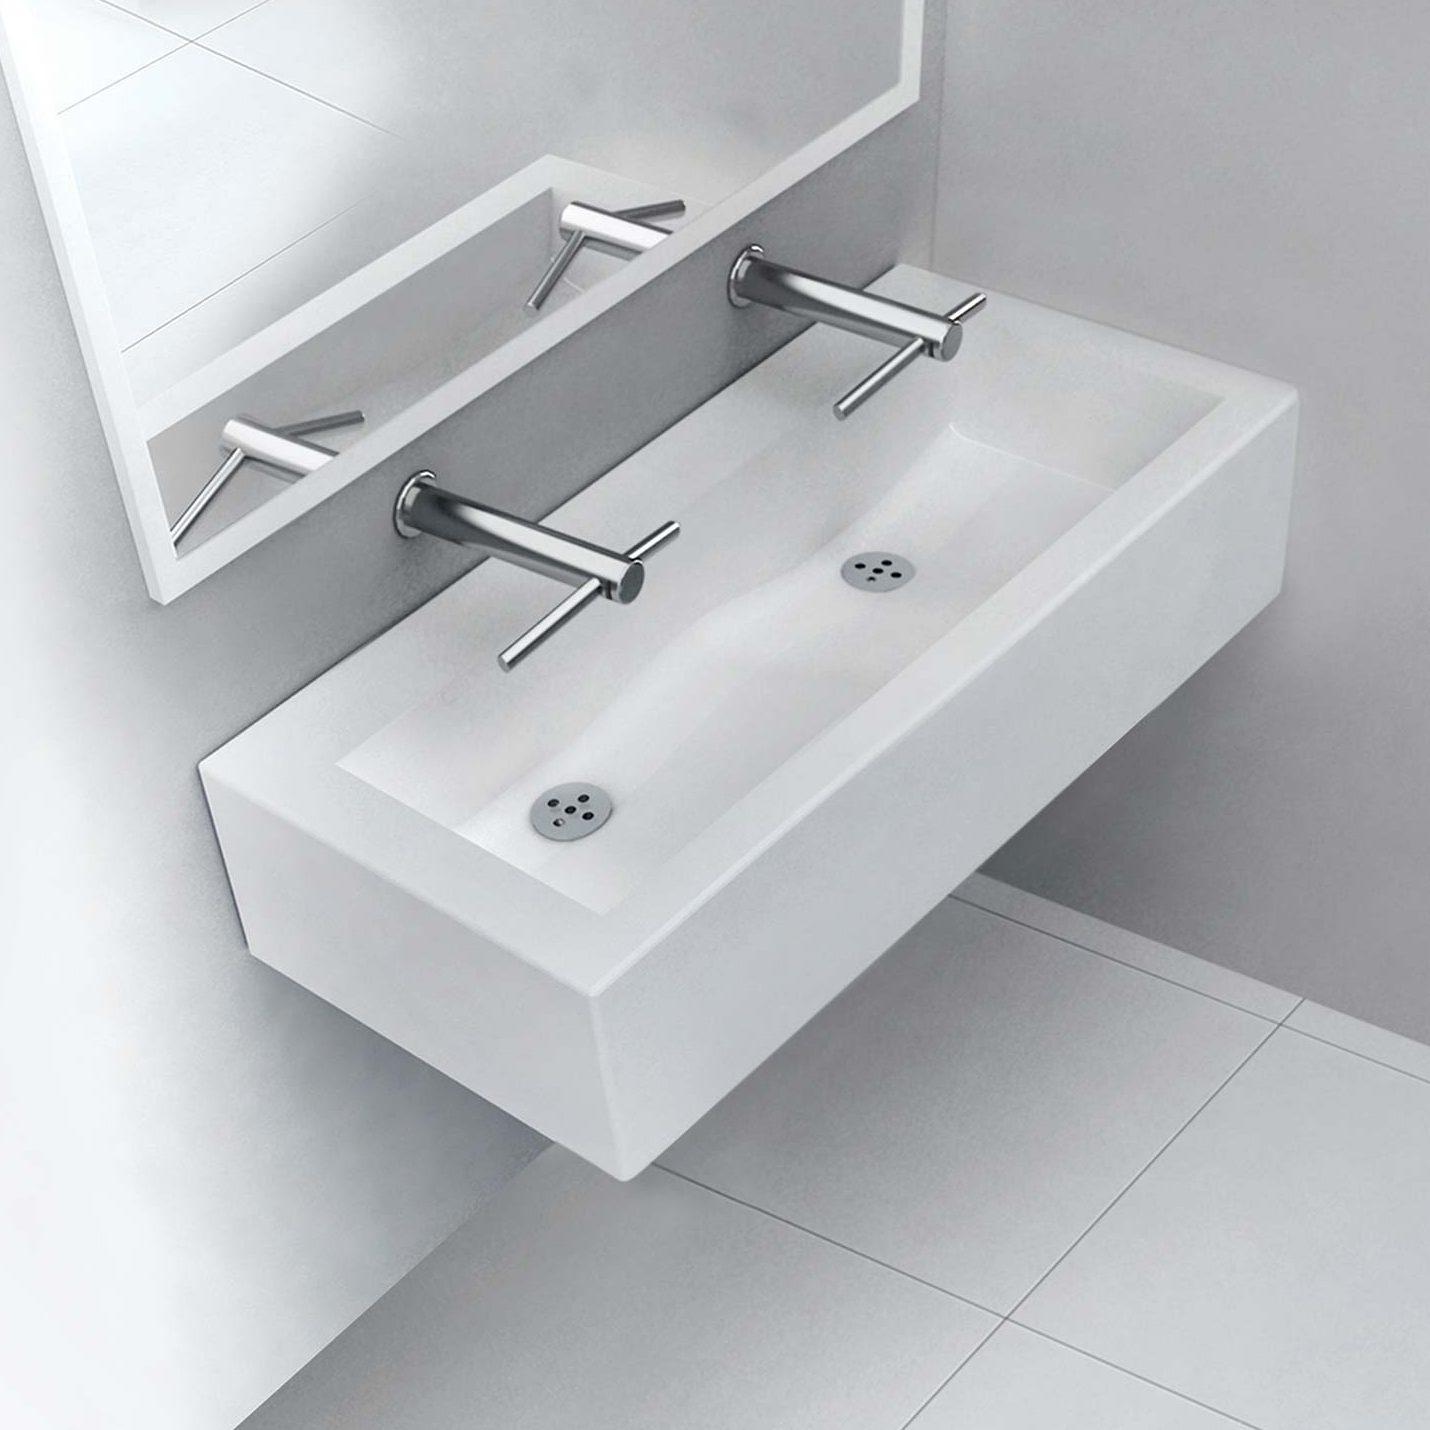 corian-washplane-3142